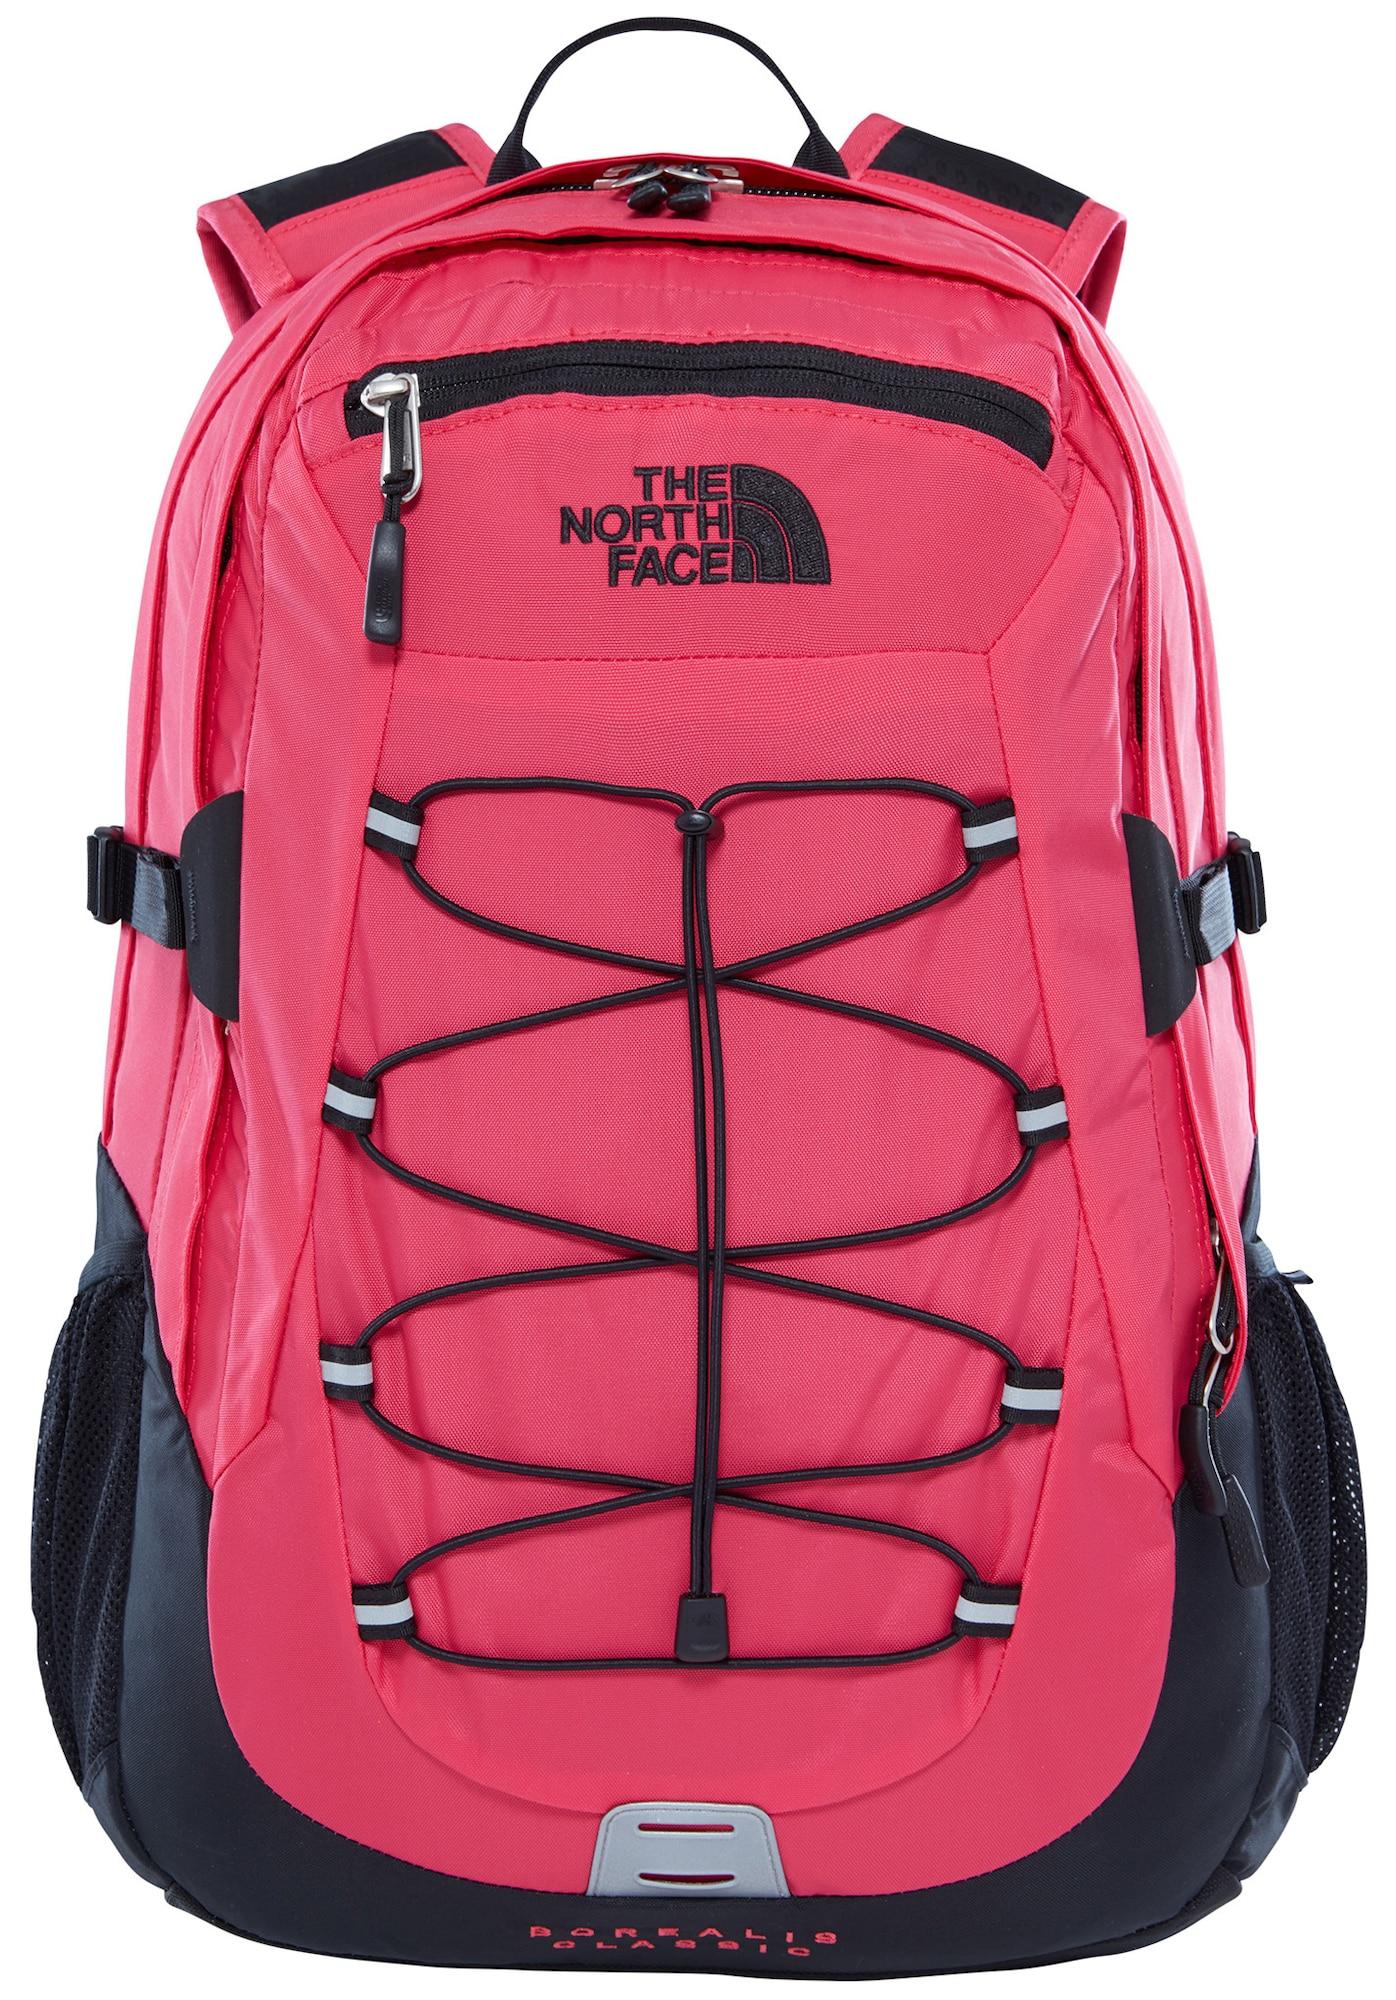 Daypack 'Borealis Classic' | Taschen > Rucksäcke > Tourenrucksäcke | Pink - Schwarz | The North Face